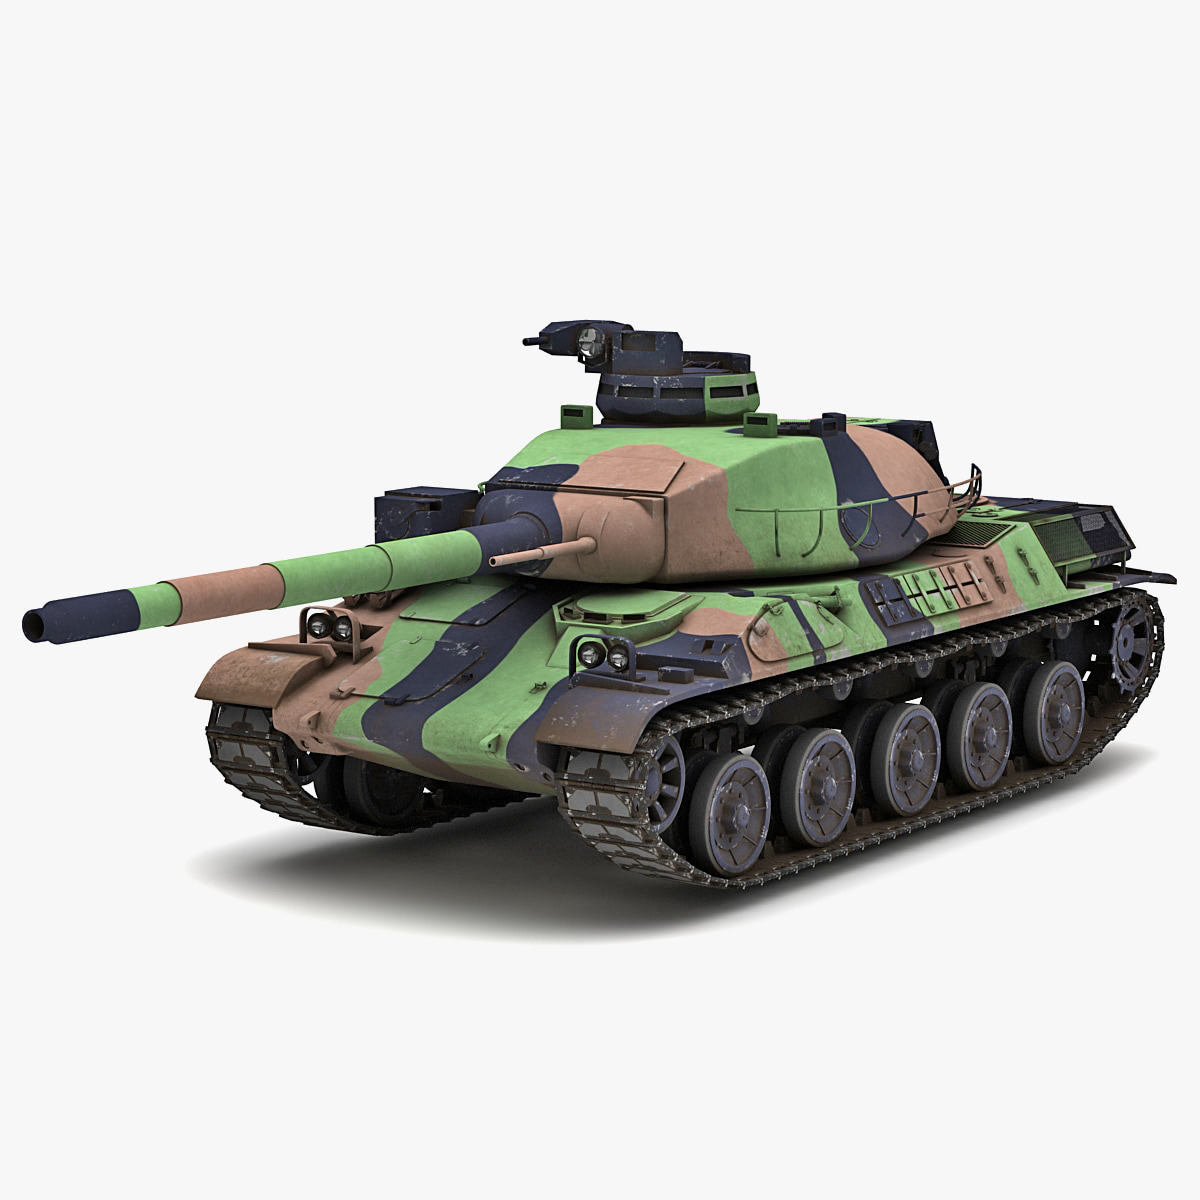 179737_AMX-32_France_Main_Battle_Tank___0001.jpg